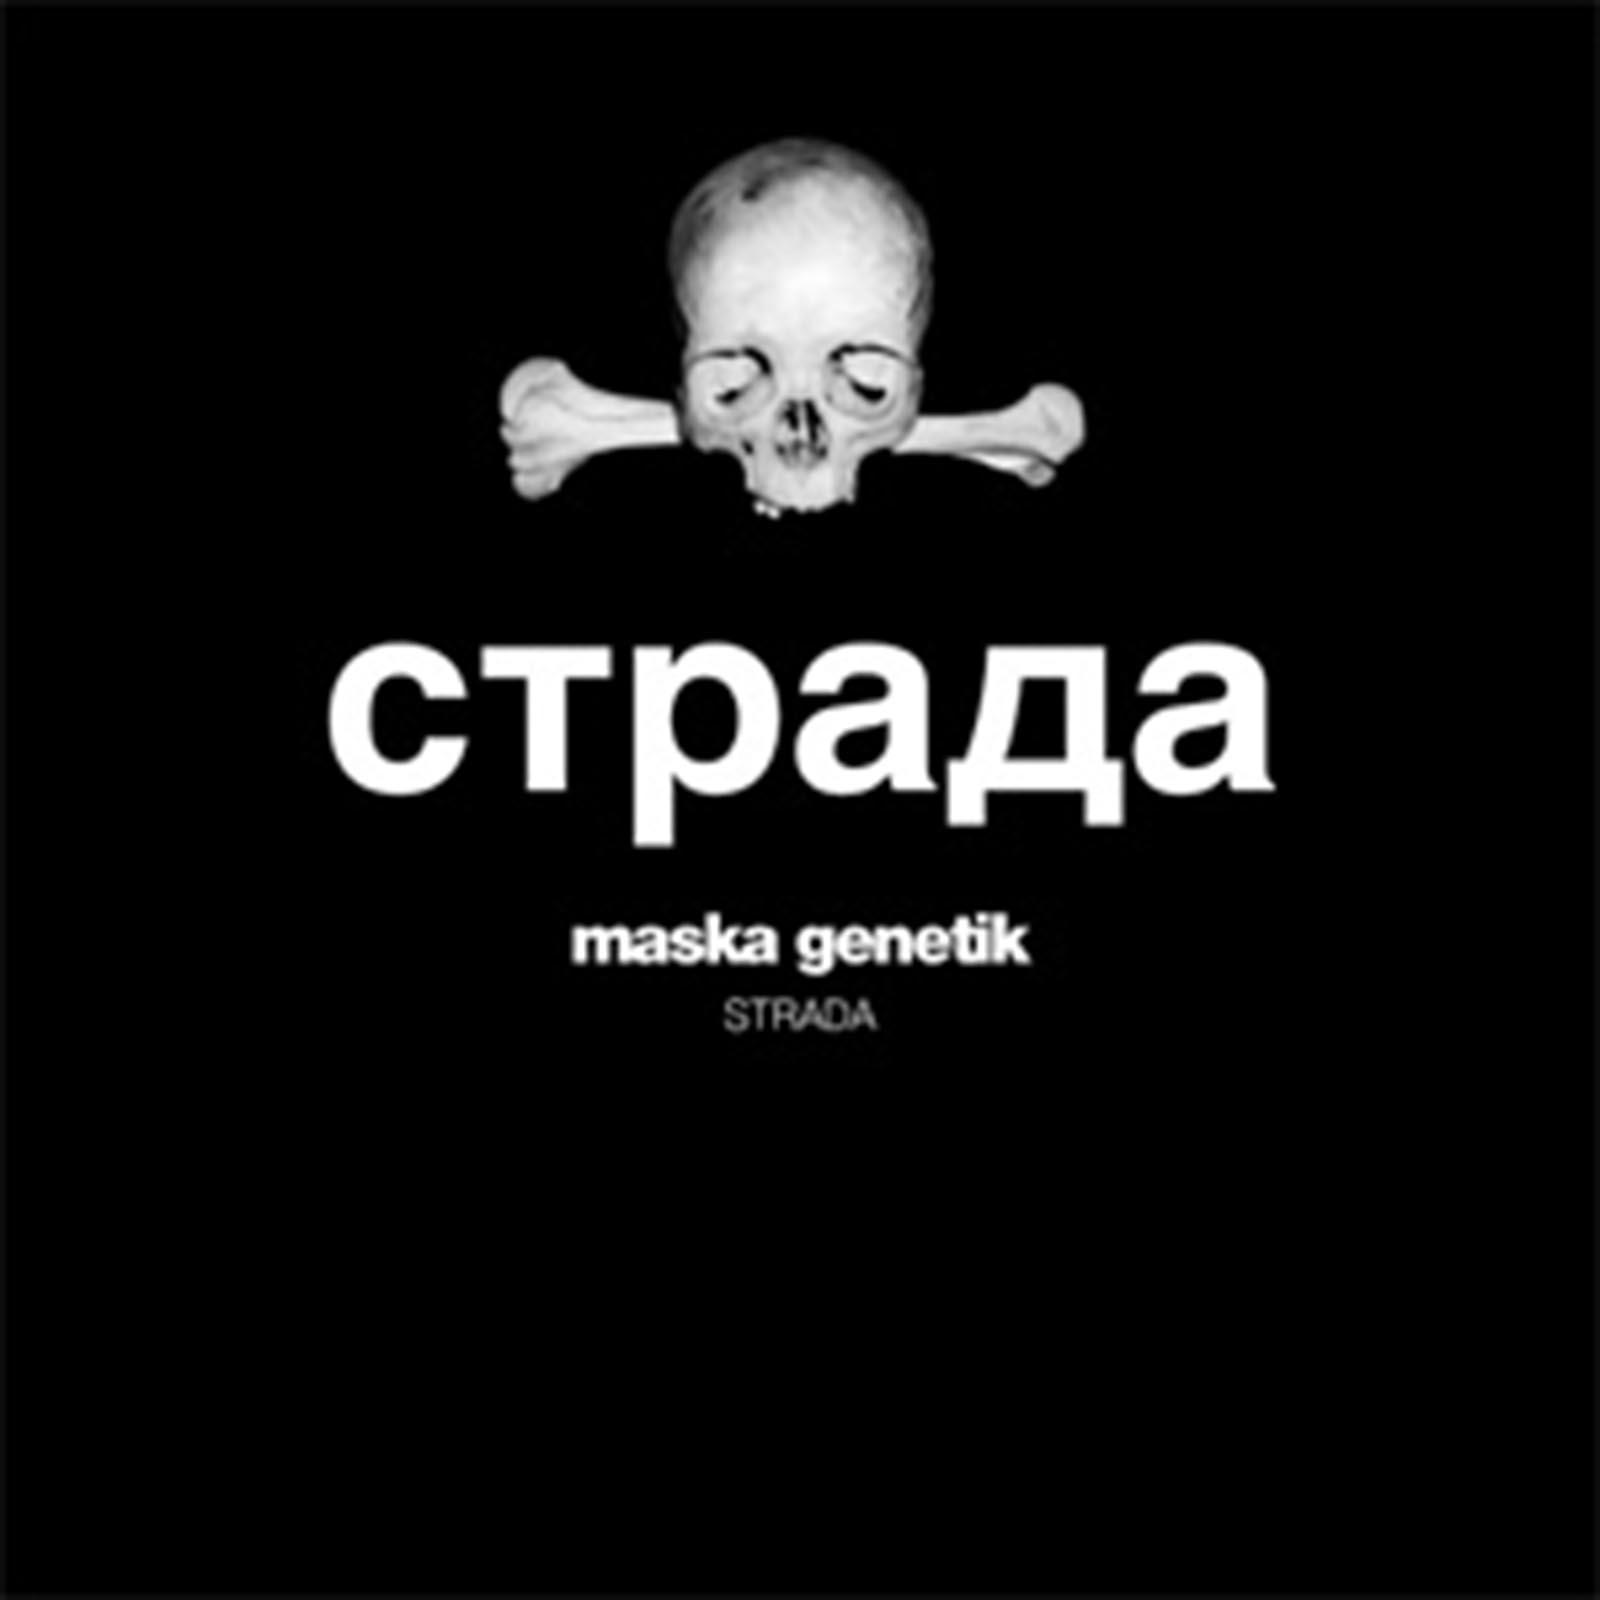 MASKA GENETIK – STRADA (Galakthorrö 027, CD ALBUM, 2011) (MP3 320)